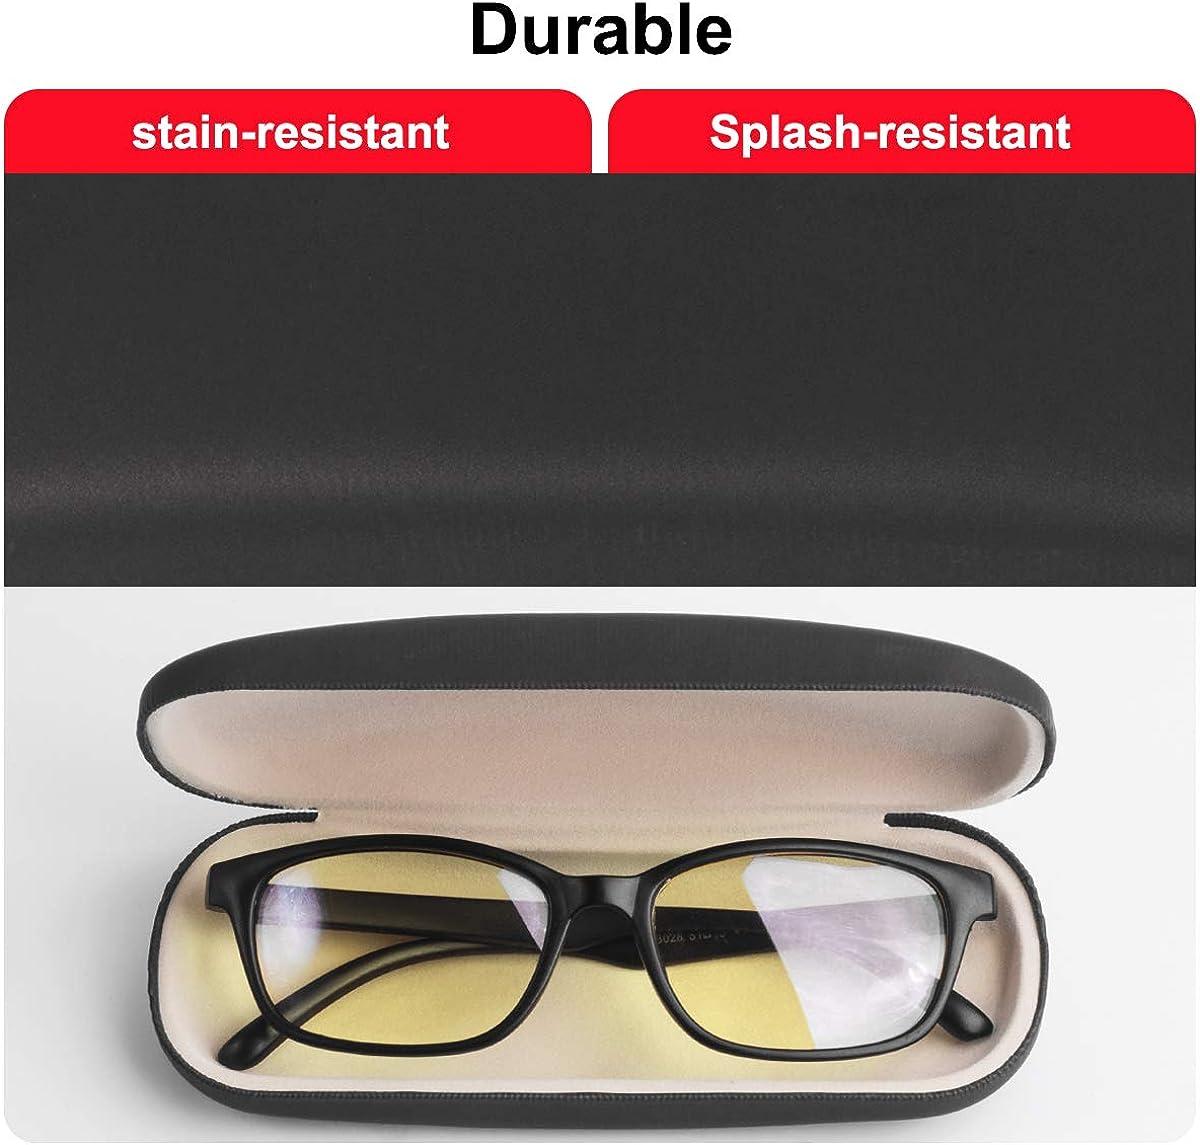 AkoaDa Hard Glasses Case Protective Cover for Glasses 2 Pack